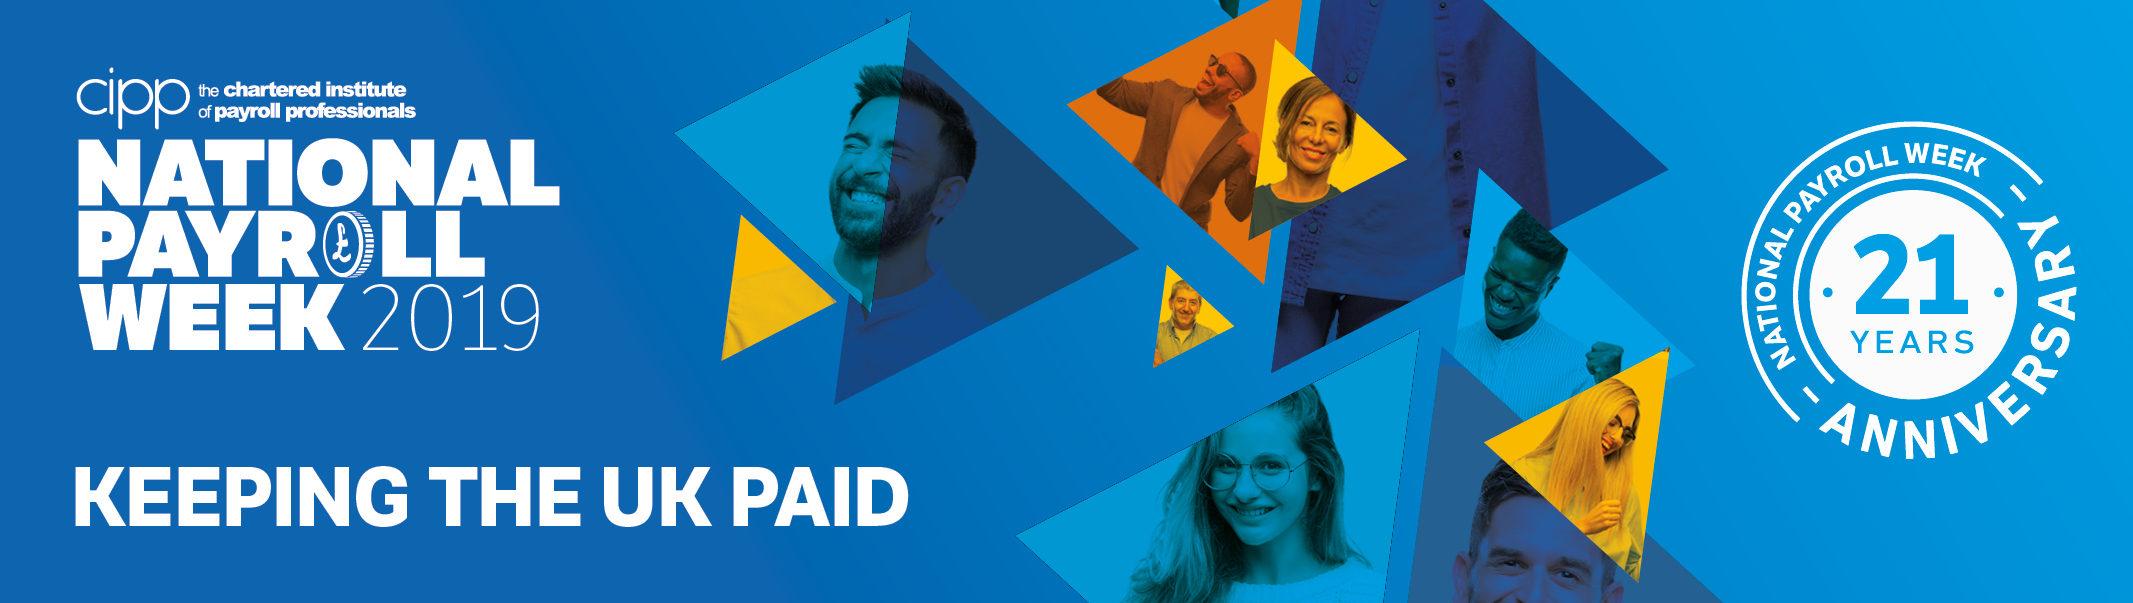 National Payroll Week 2019